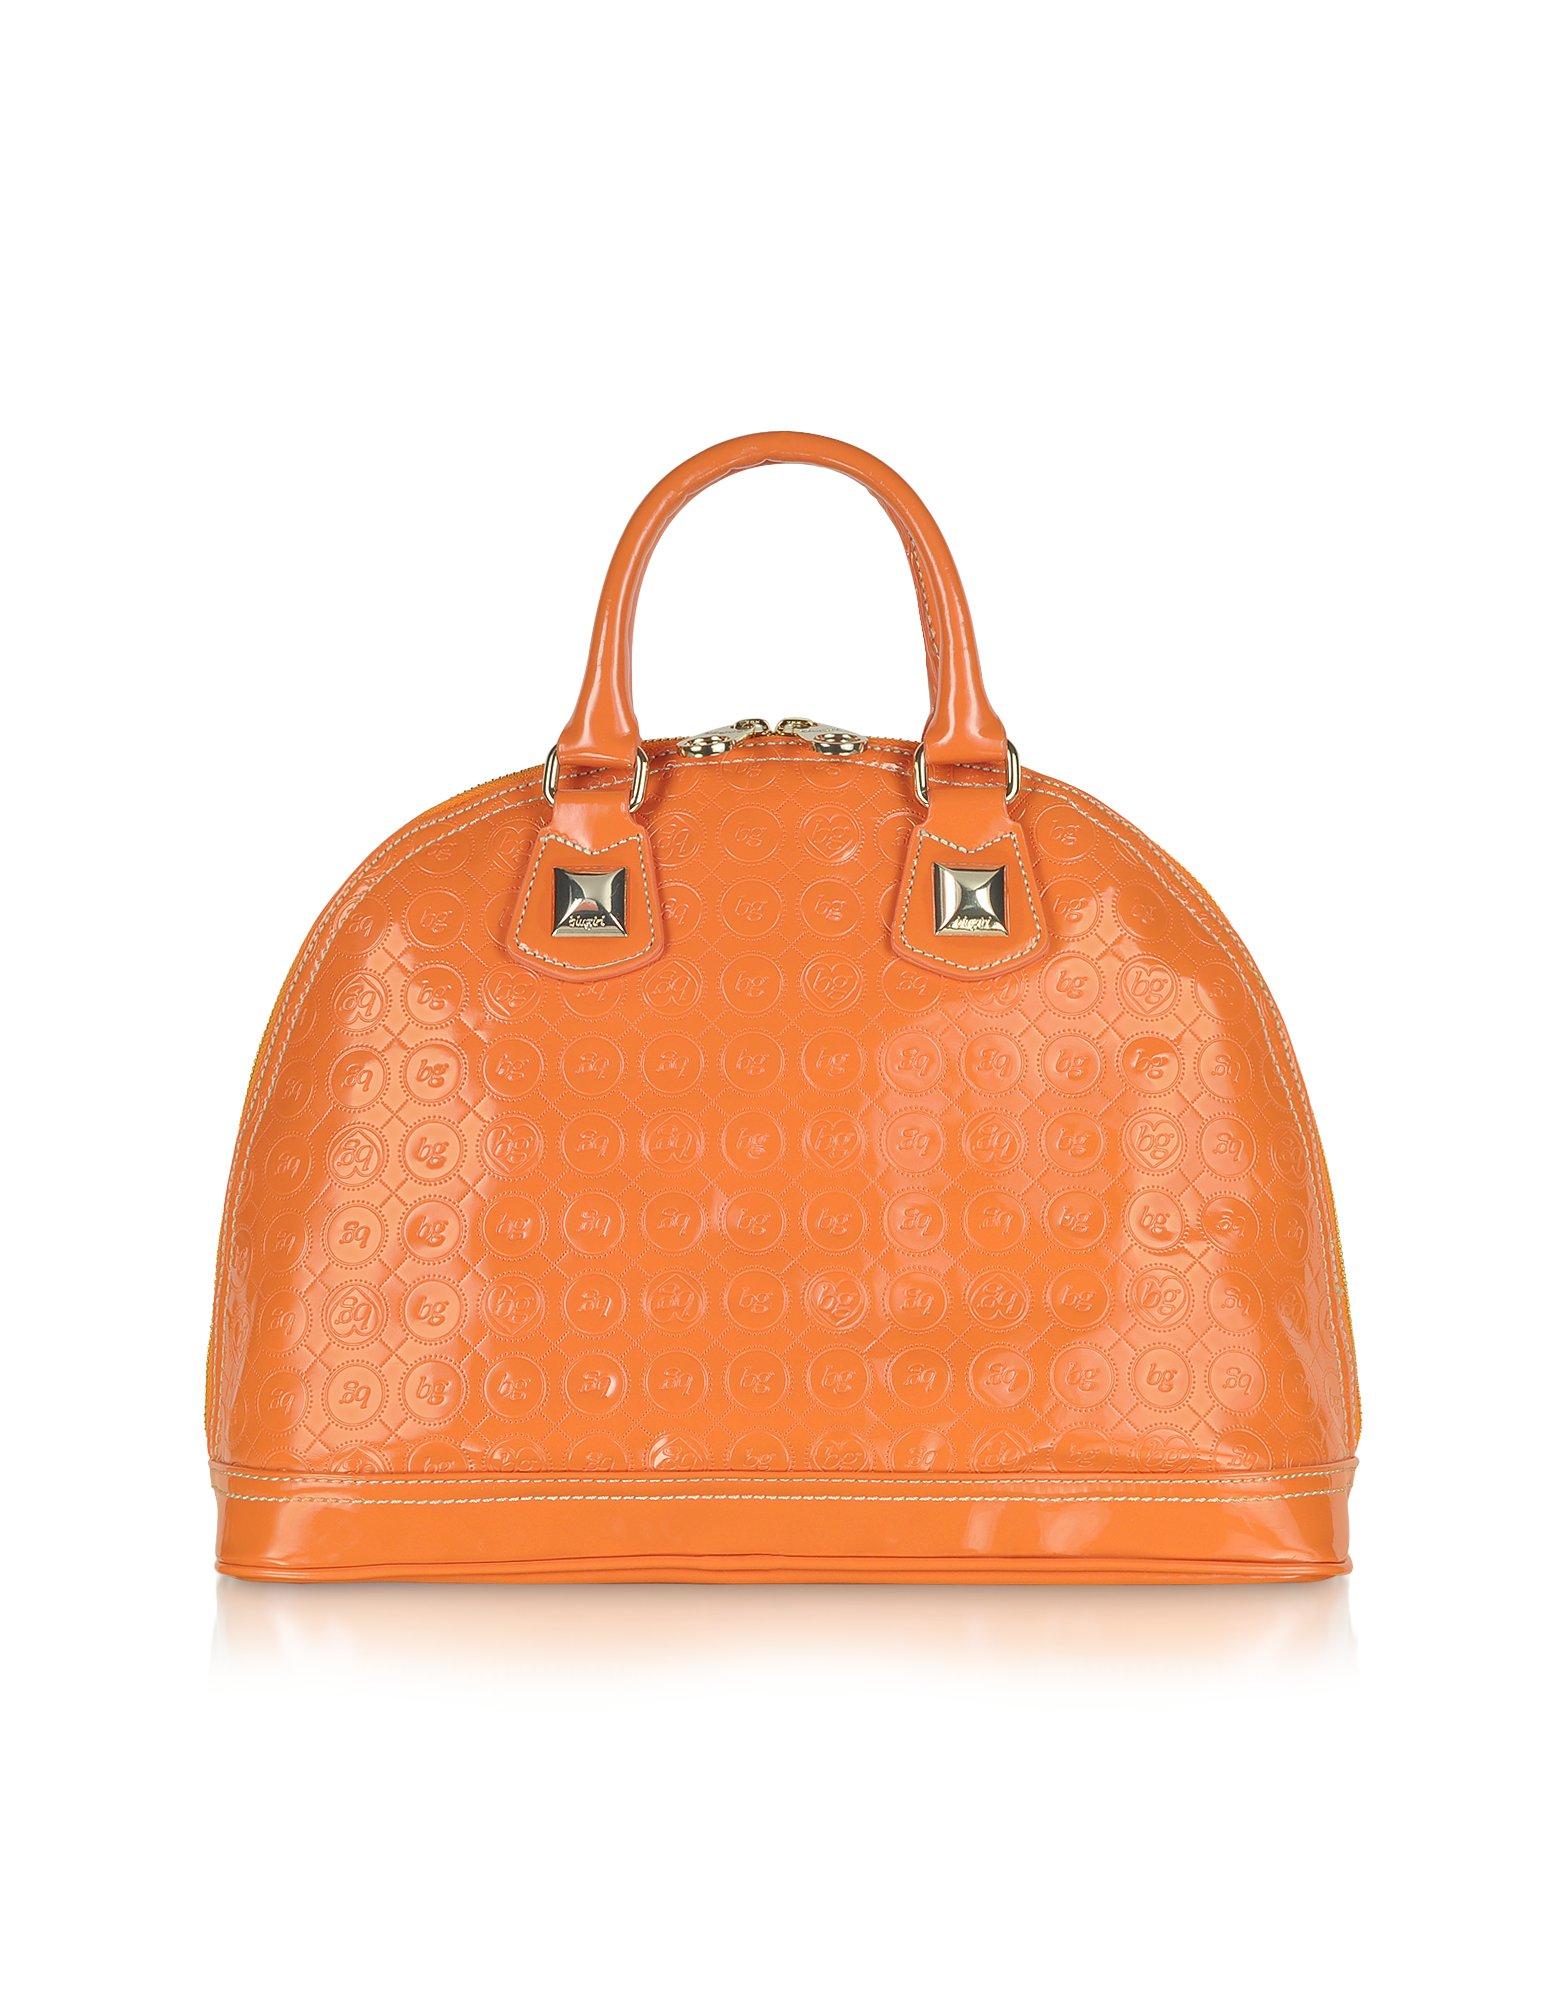 fdbbd563ff Lyst - Blugirl Blumarine Orange Patent Eco Leather Bowler Bag in Orange